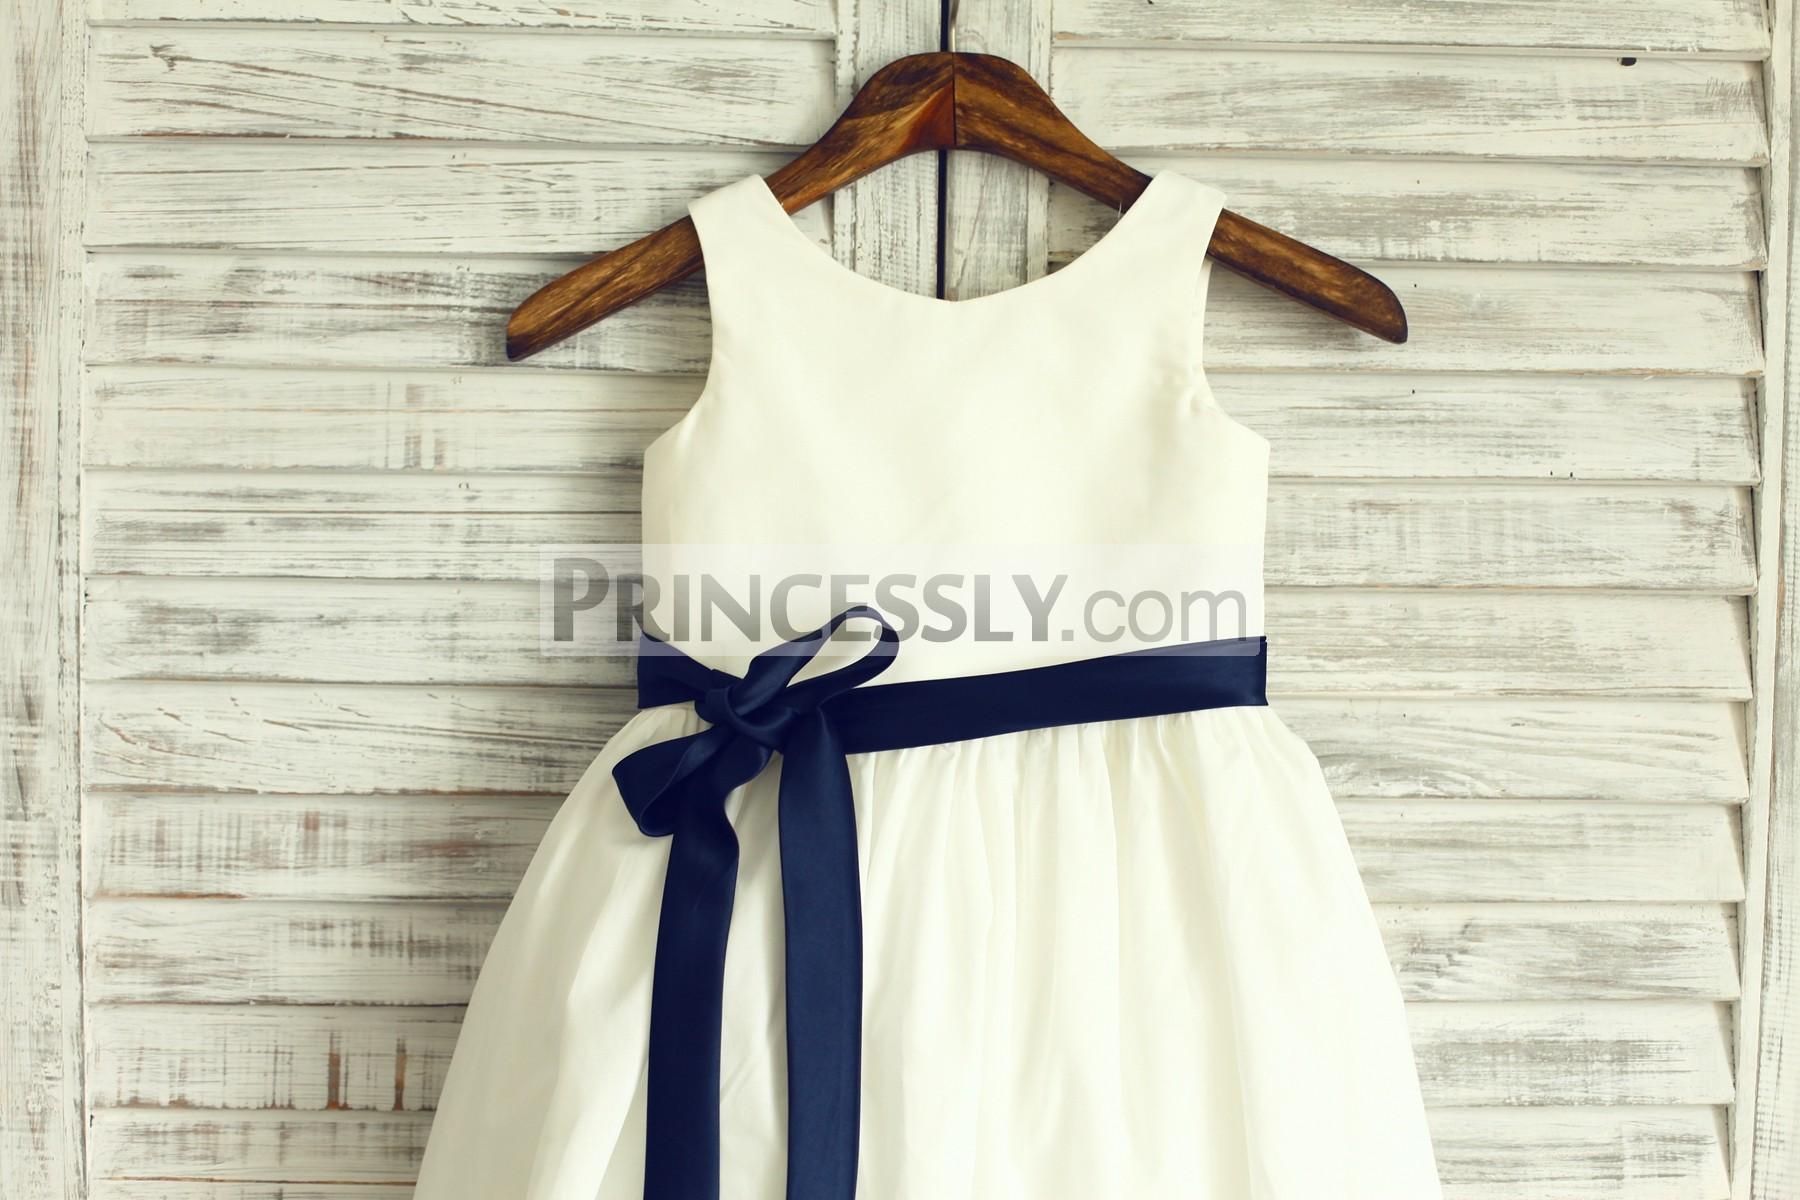 Sleeveless bodice with navy blue sash